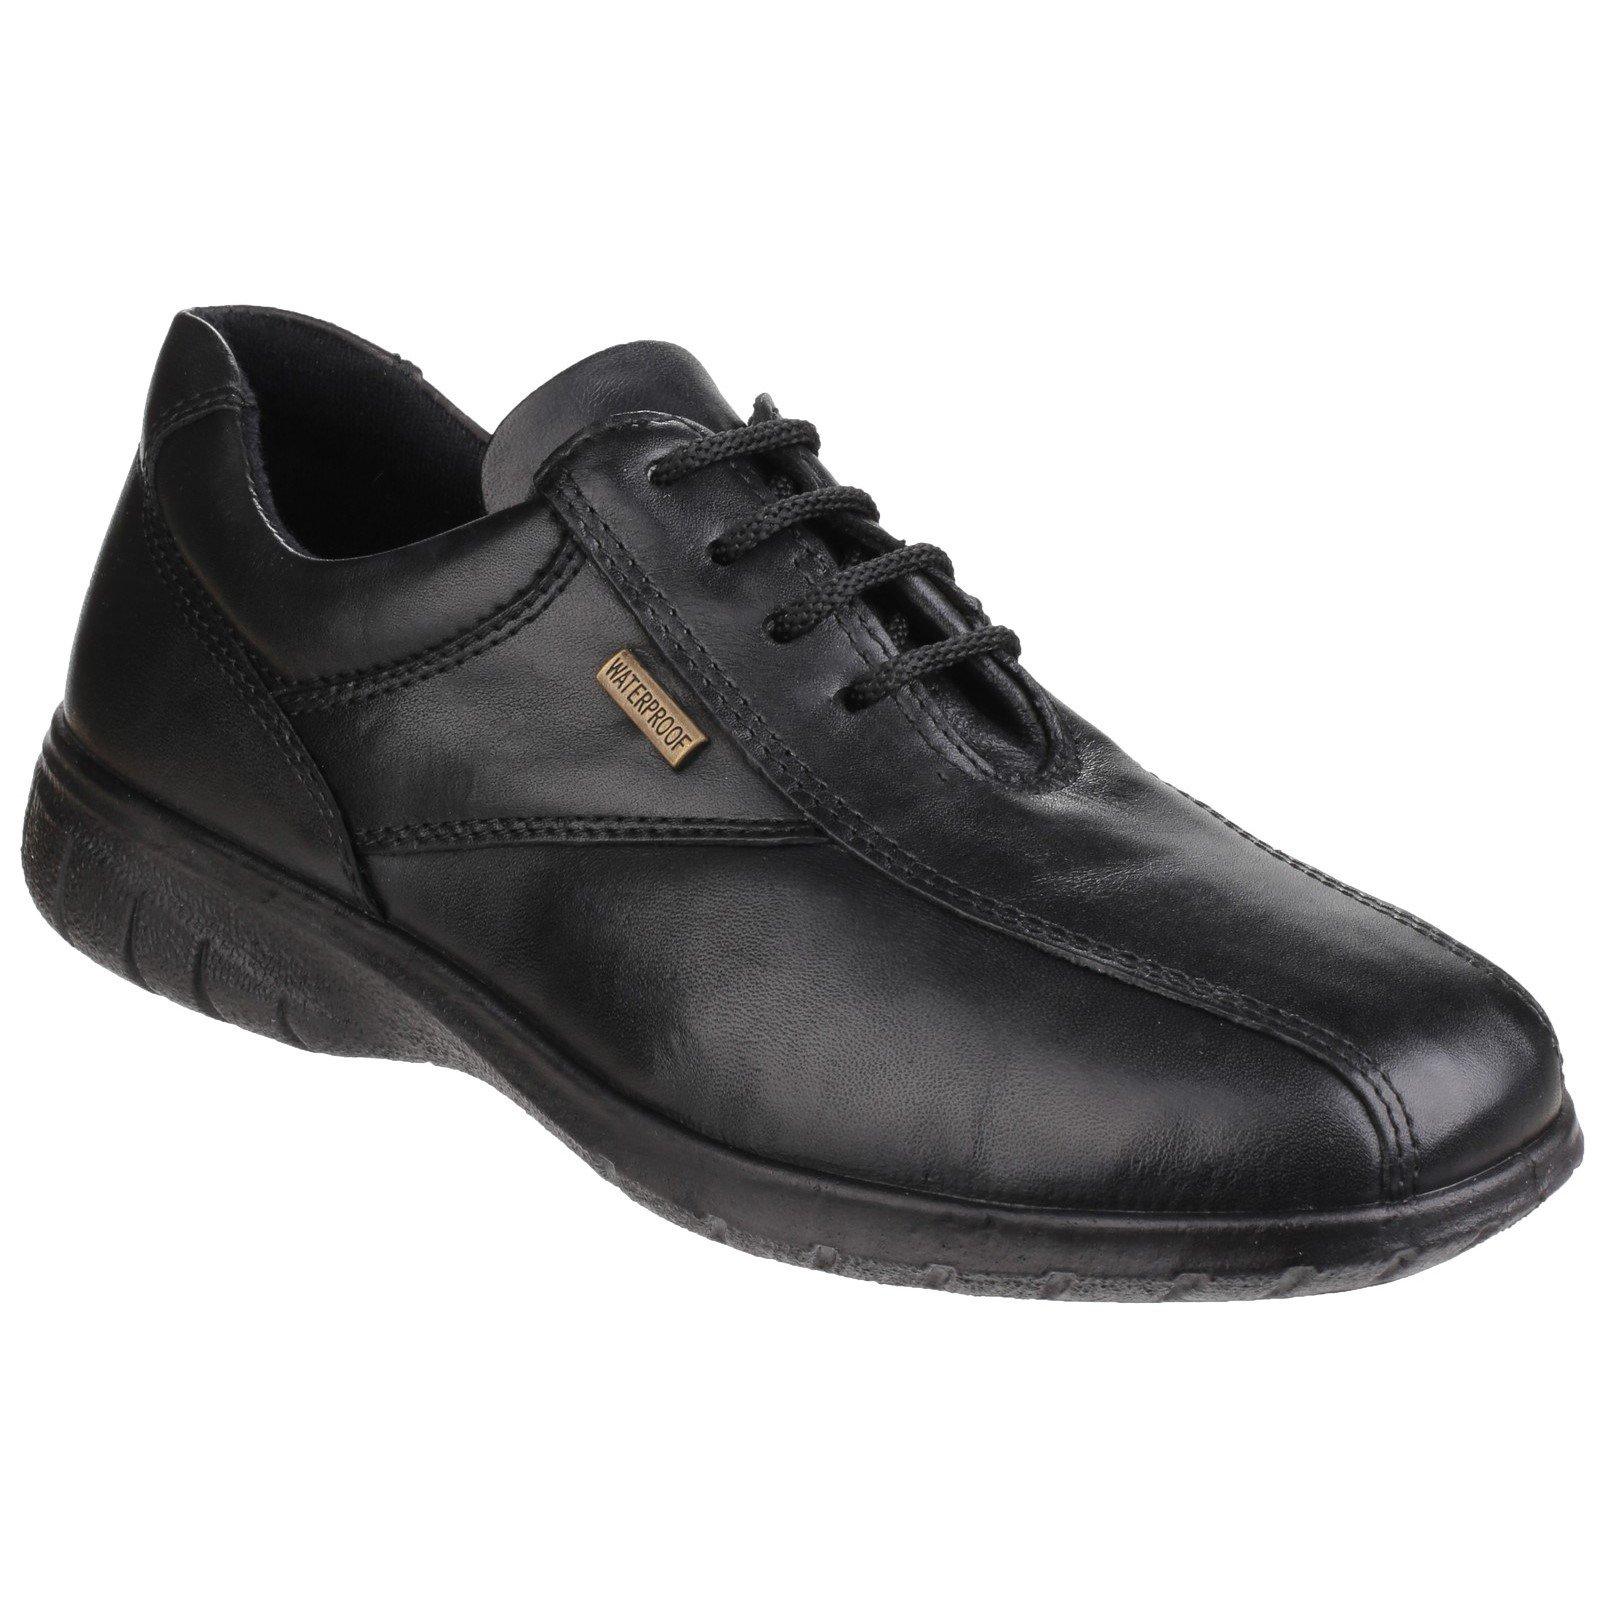 Cotswold Women's Collection Salford Shoe Various Colours 32981 - Black 6